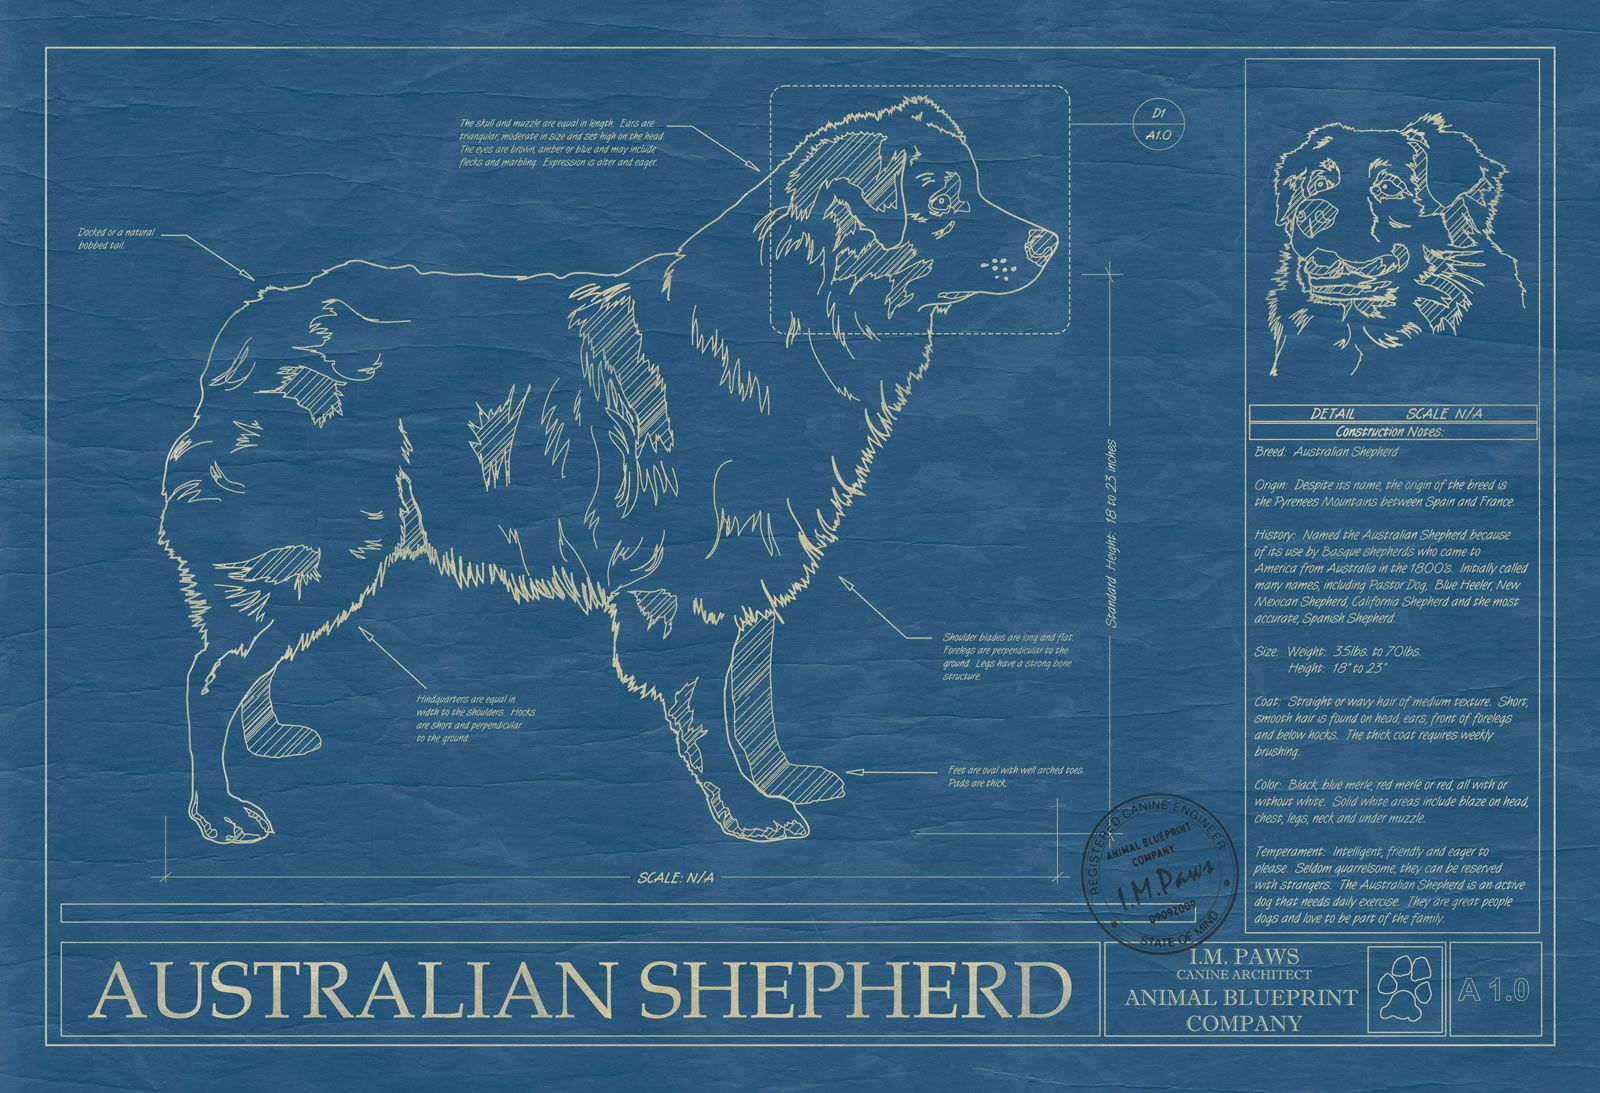 Australian shepherd products i love pinterest australian animal blueprint co malvernweather Image collections